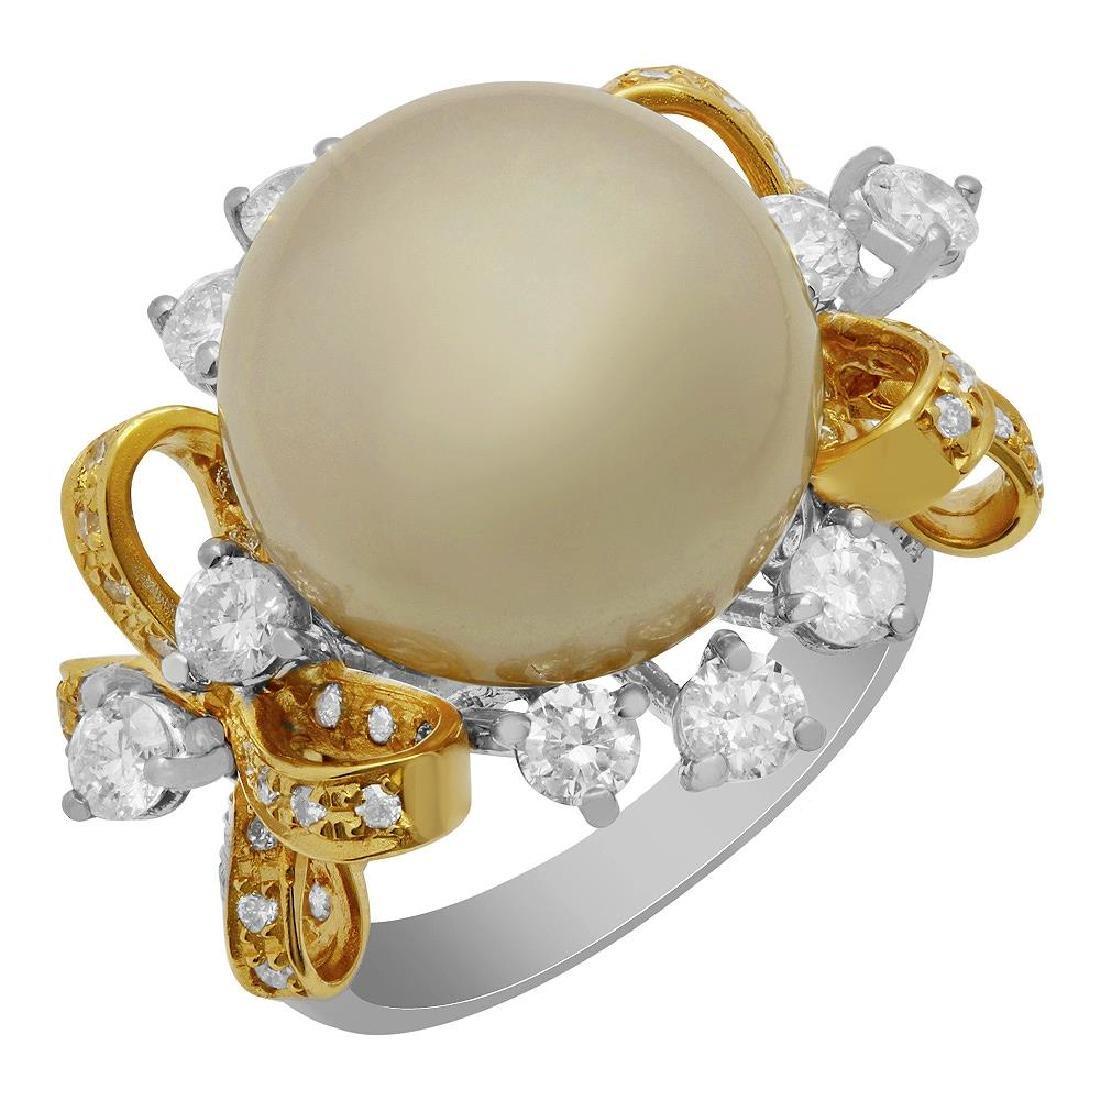 14k White & Yellow Gold 14mm Pearl 2.27ct Diamond Ring